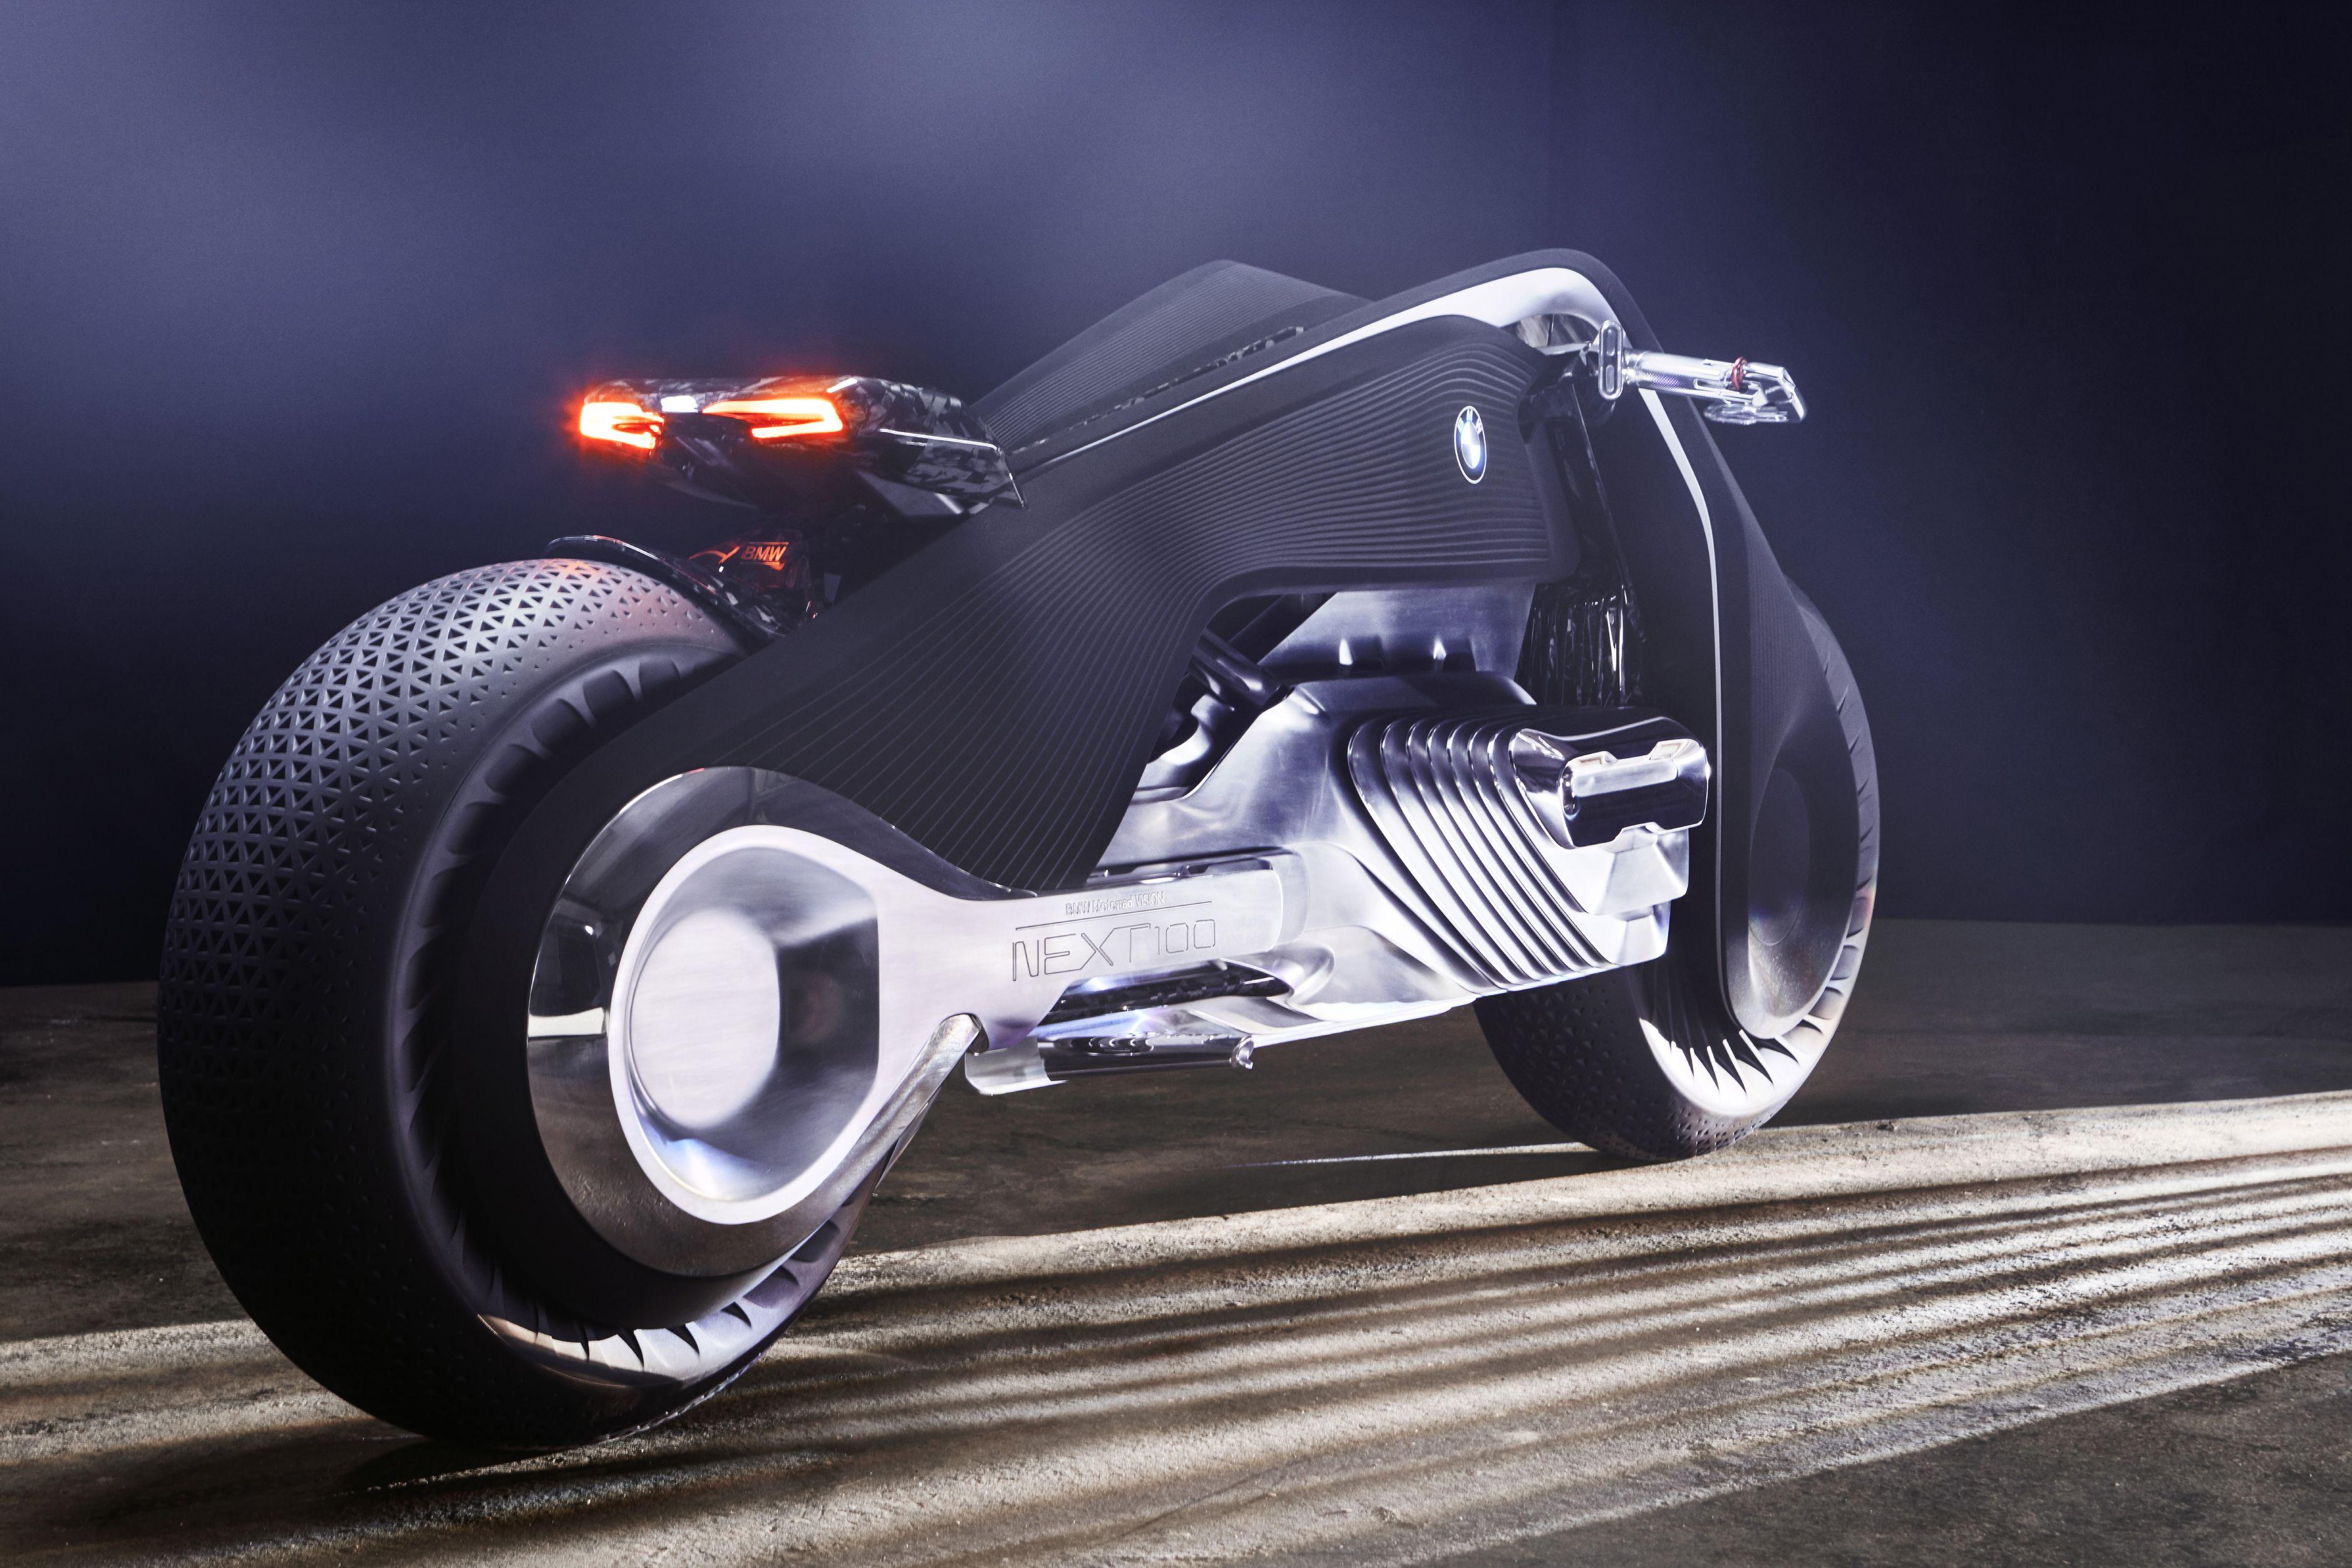 Bmw Reveals New Concept Motorcycle Visordown